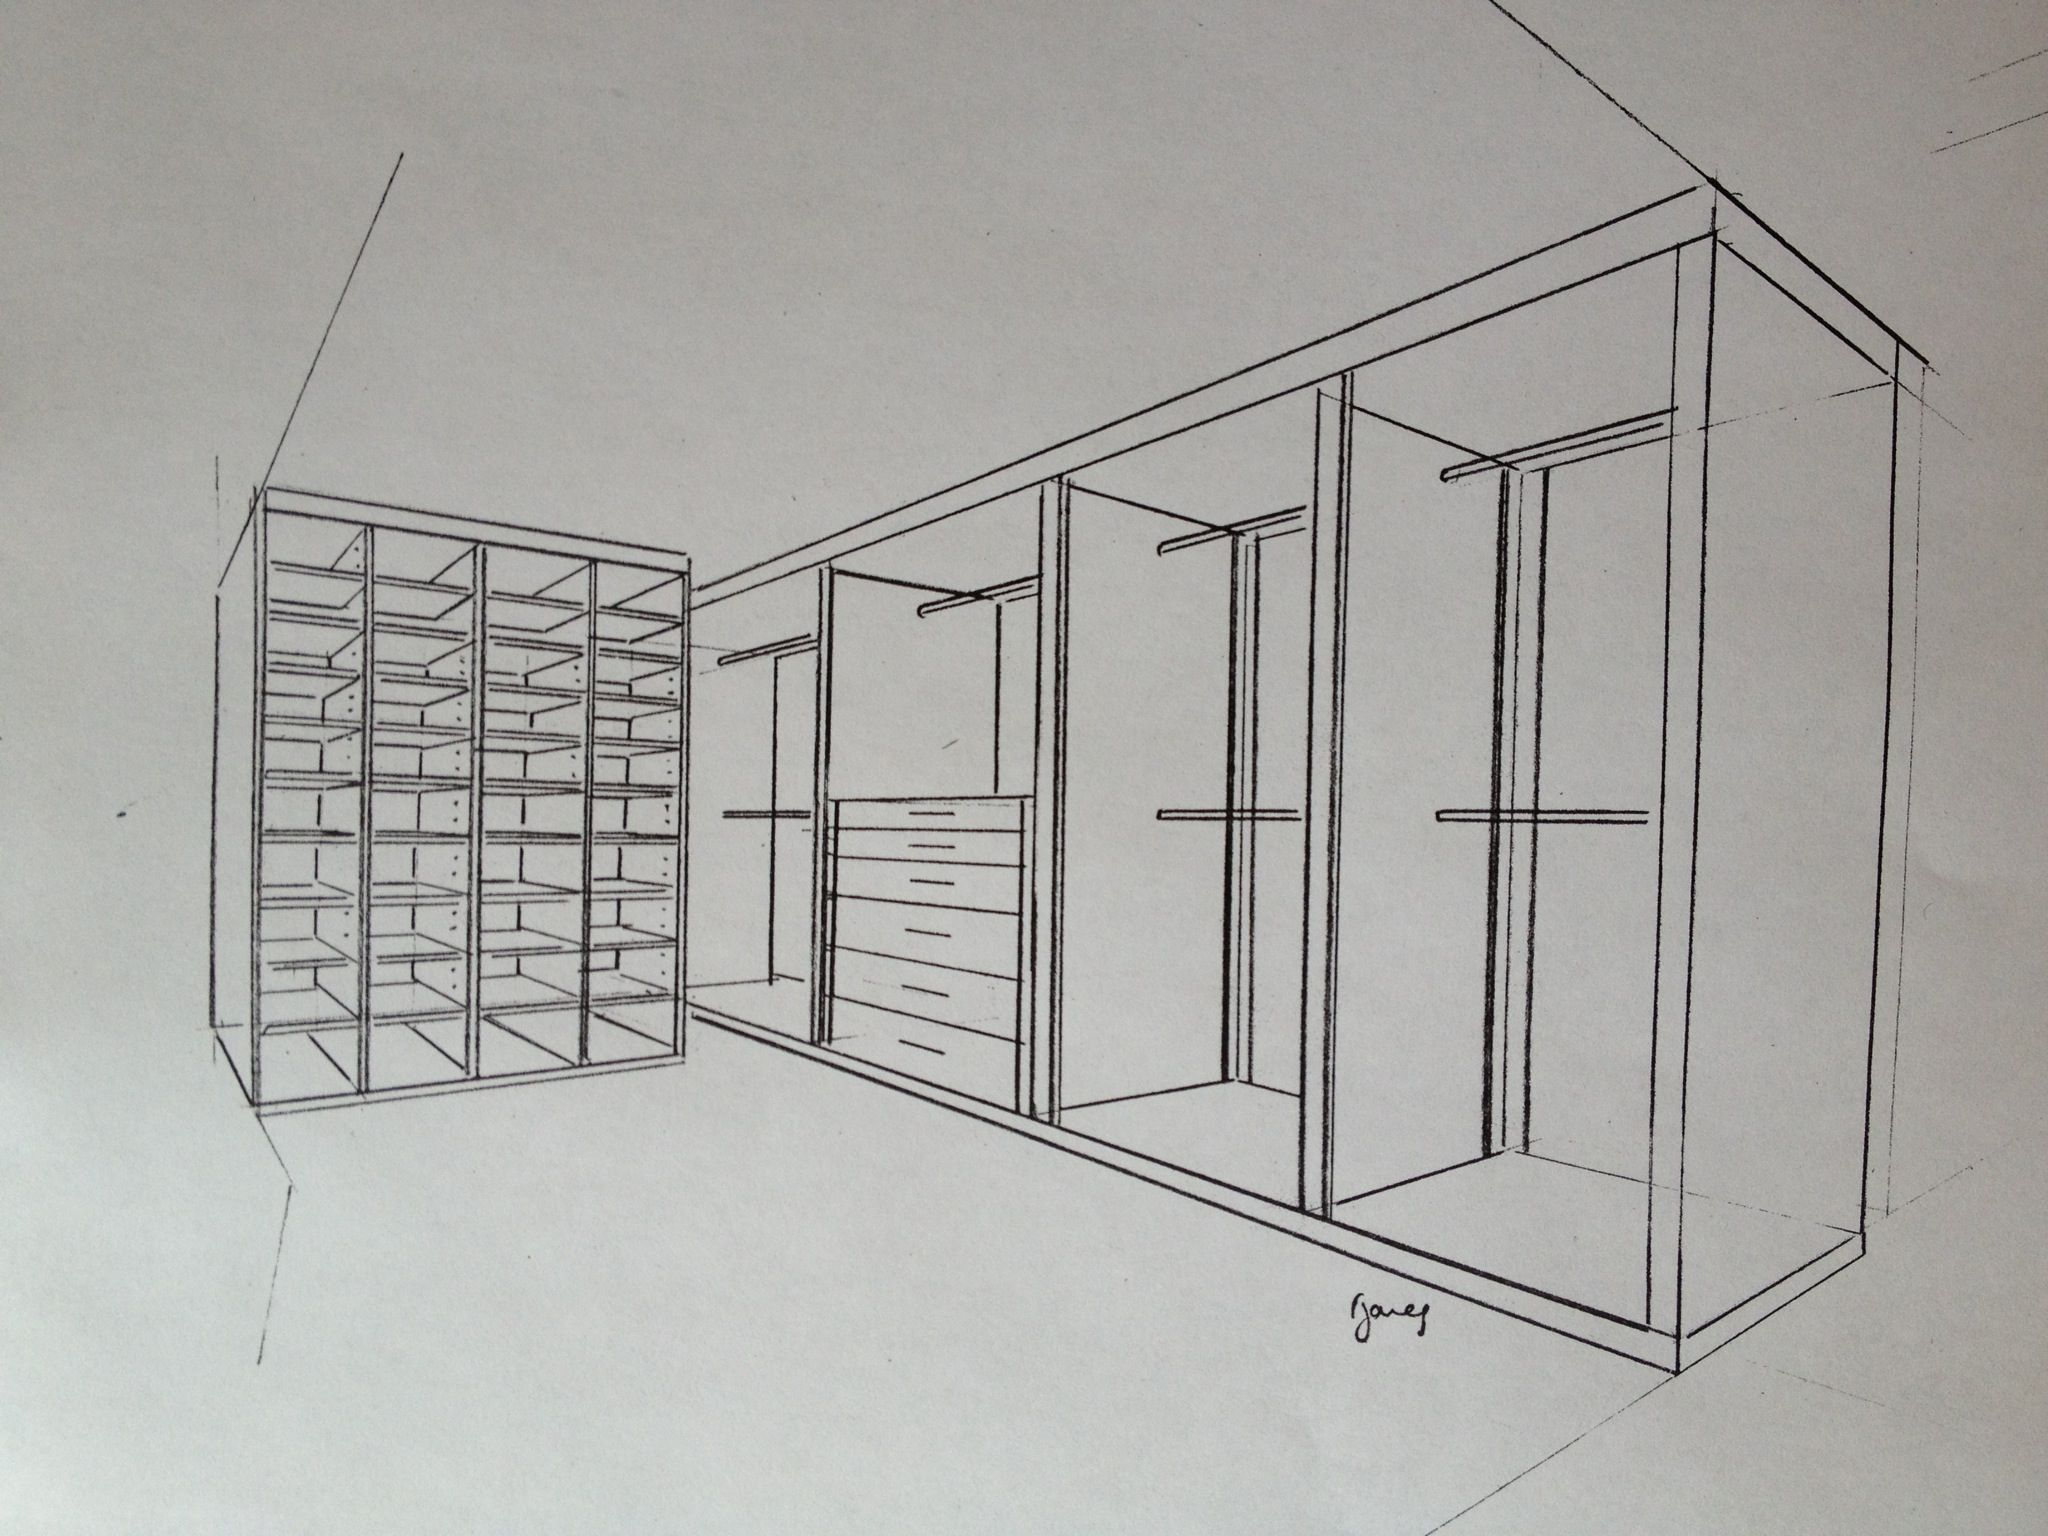 Proposal sketch design for walk in wardrobe